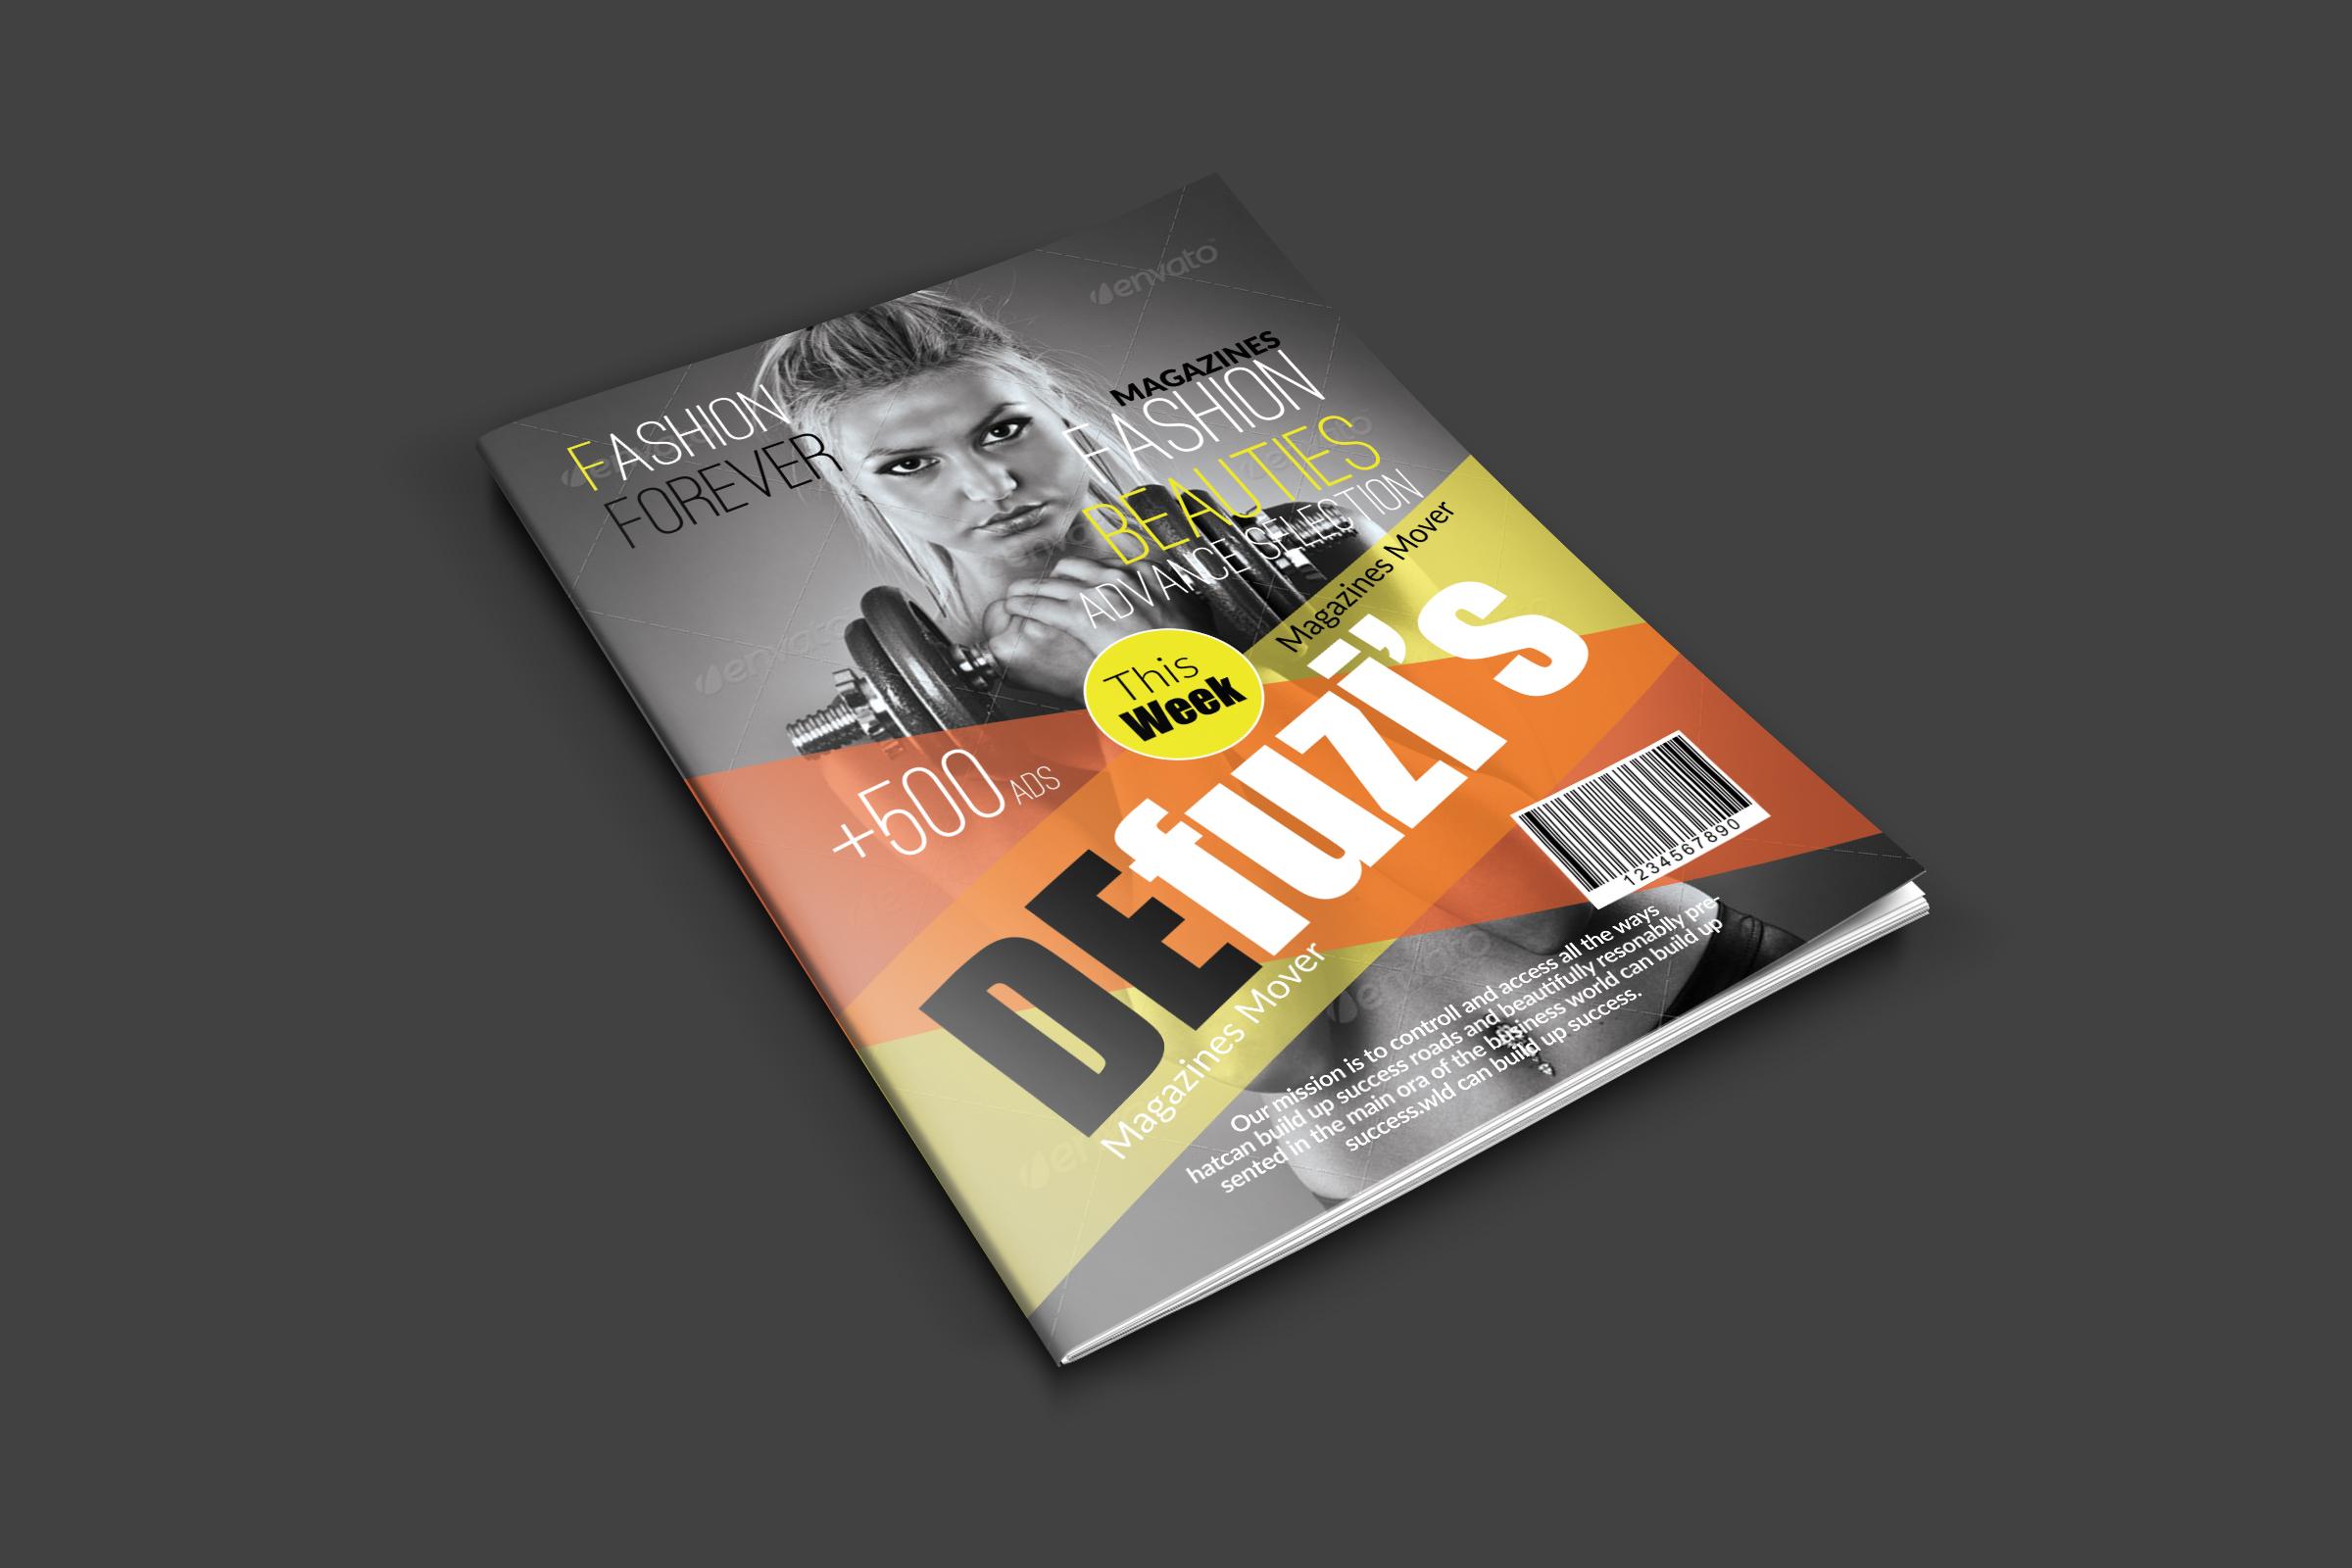 Body Fitness Magazine Cover example image 2